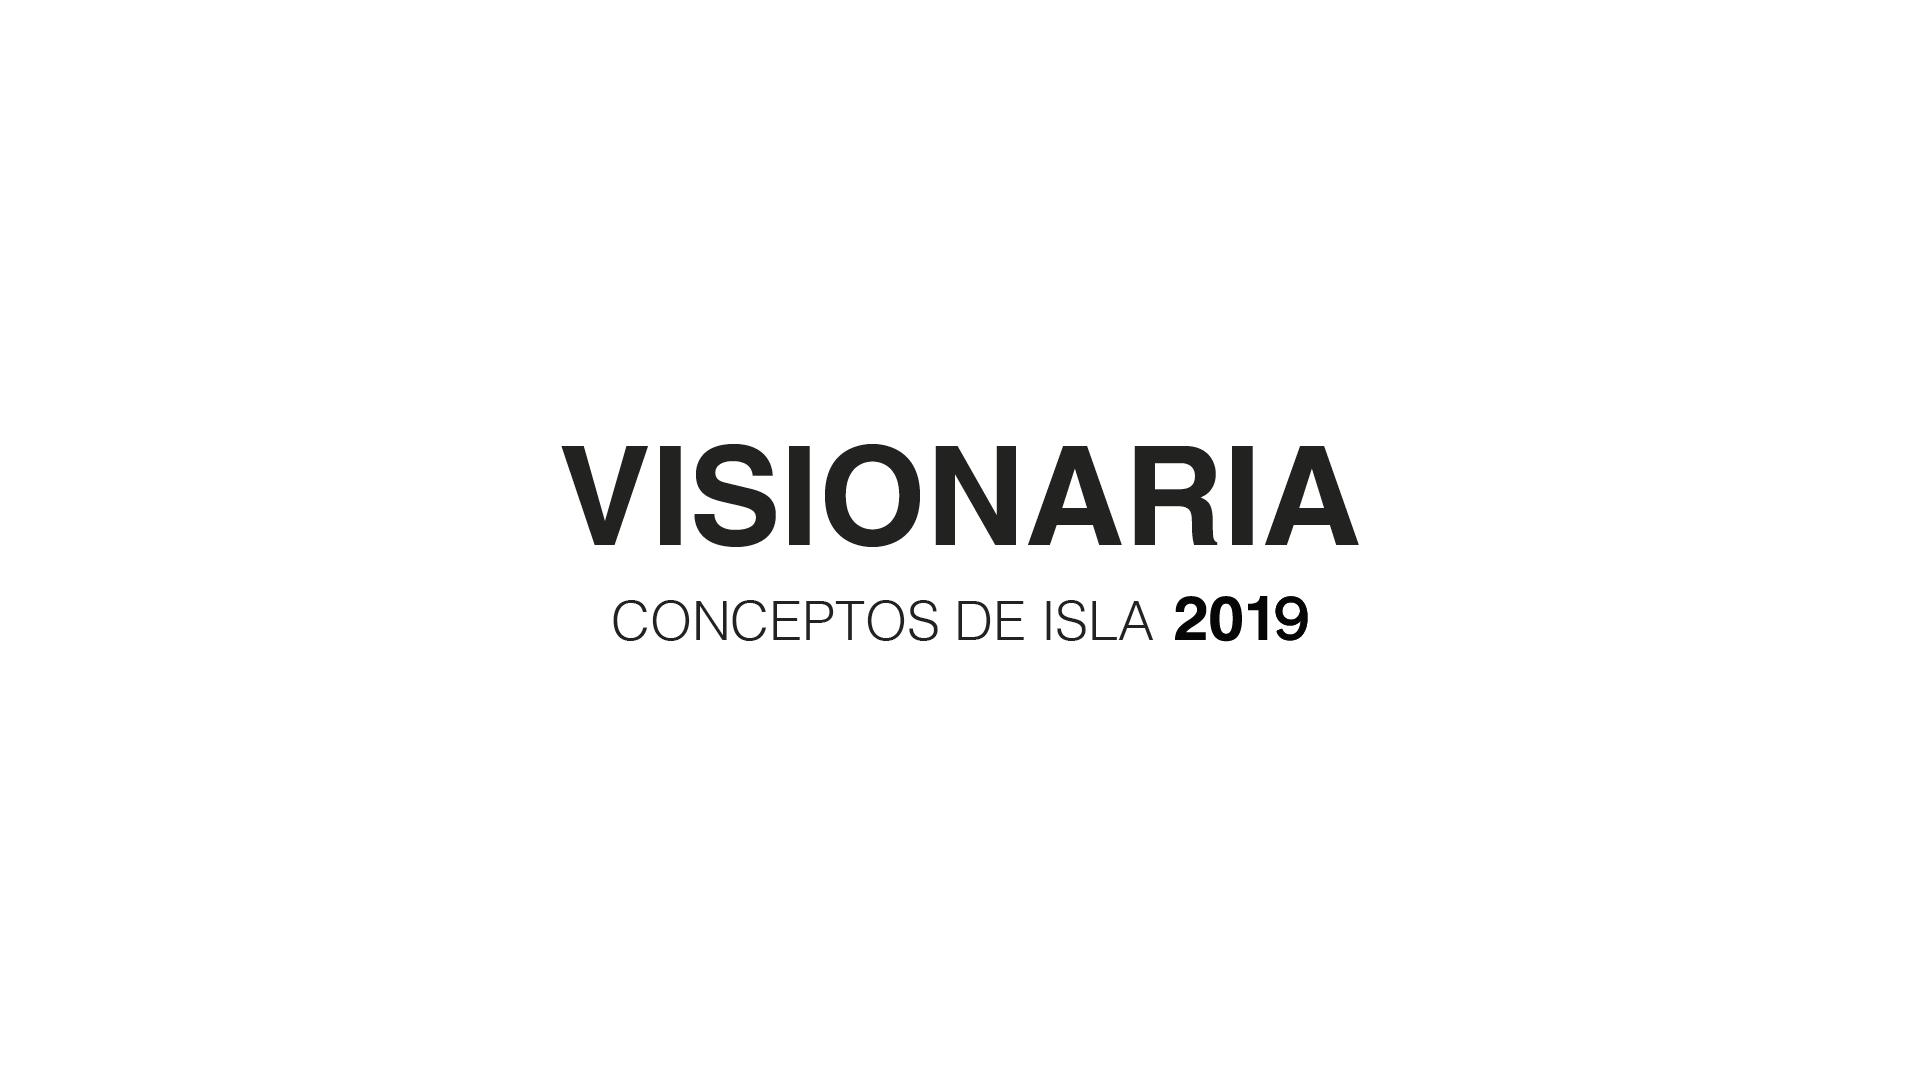 logo_visionaria_2019.png